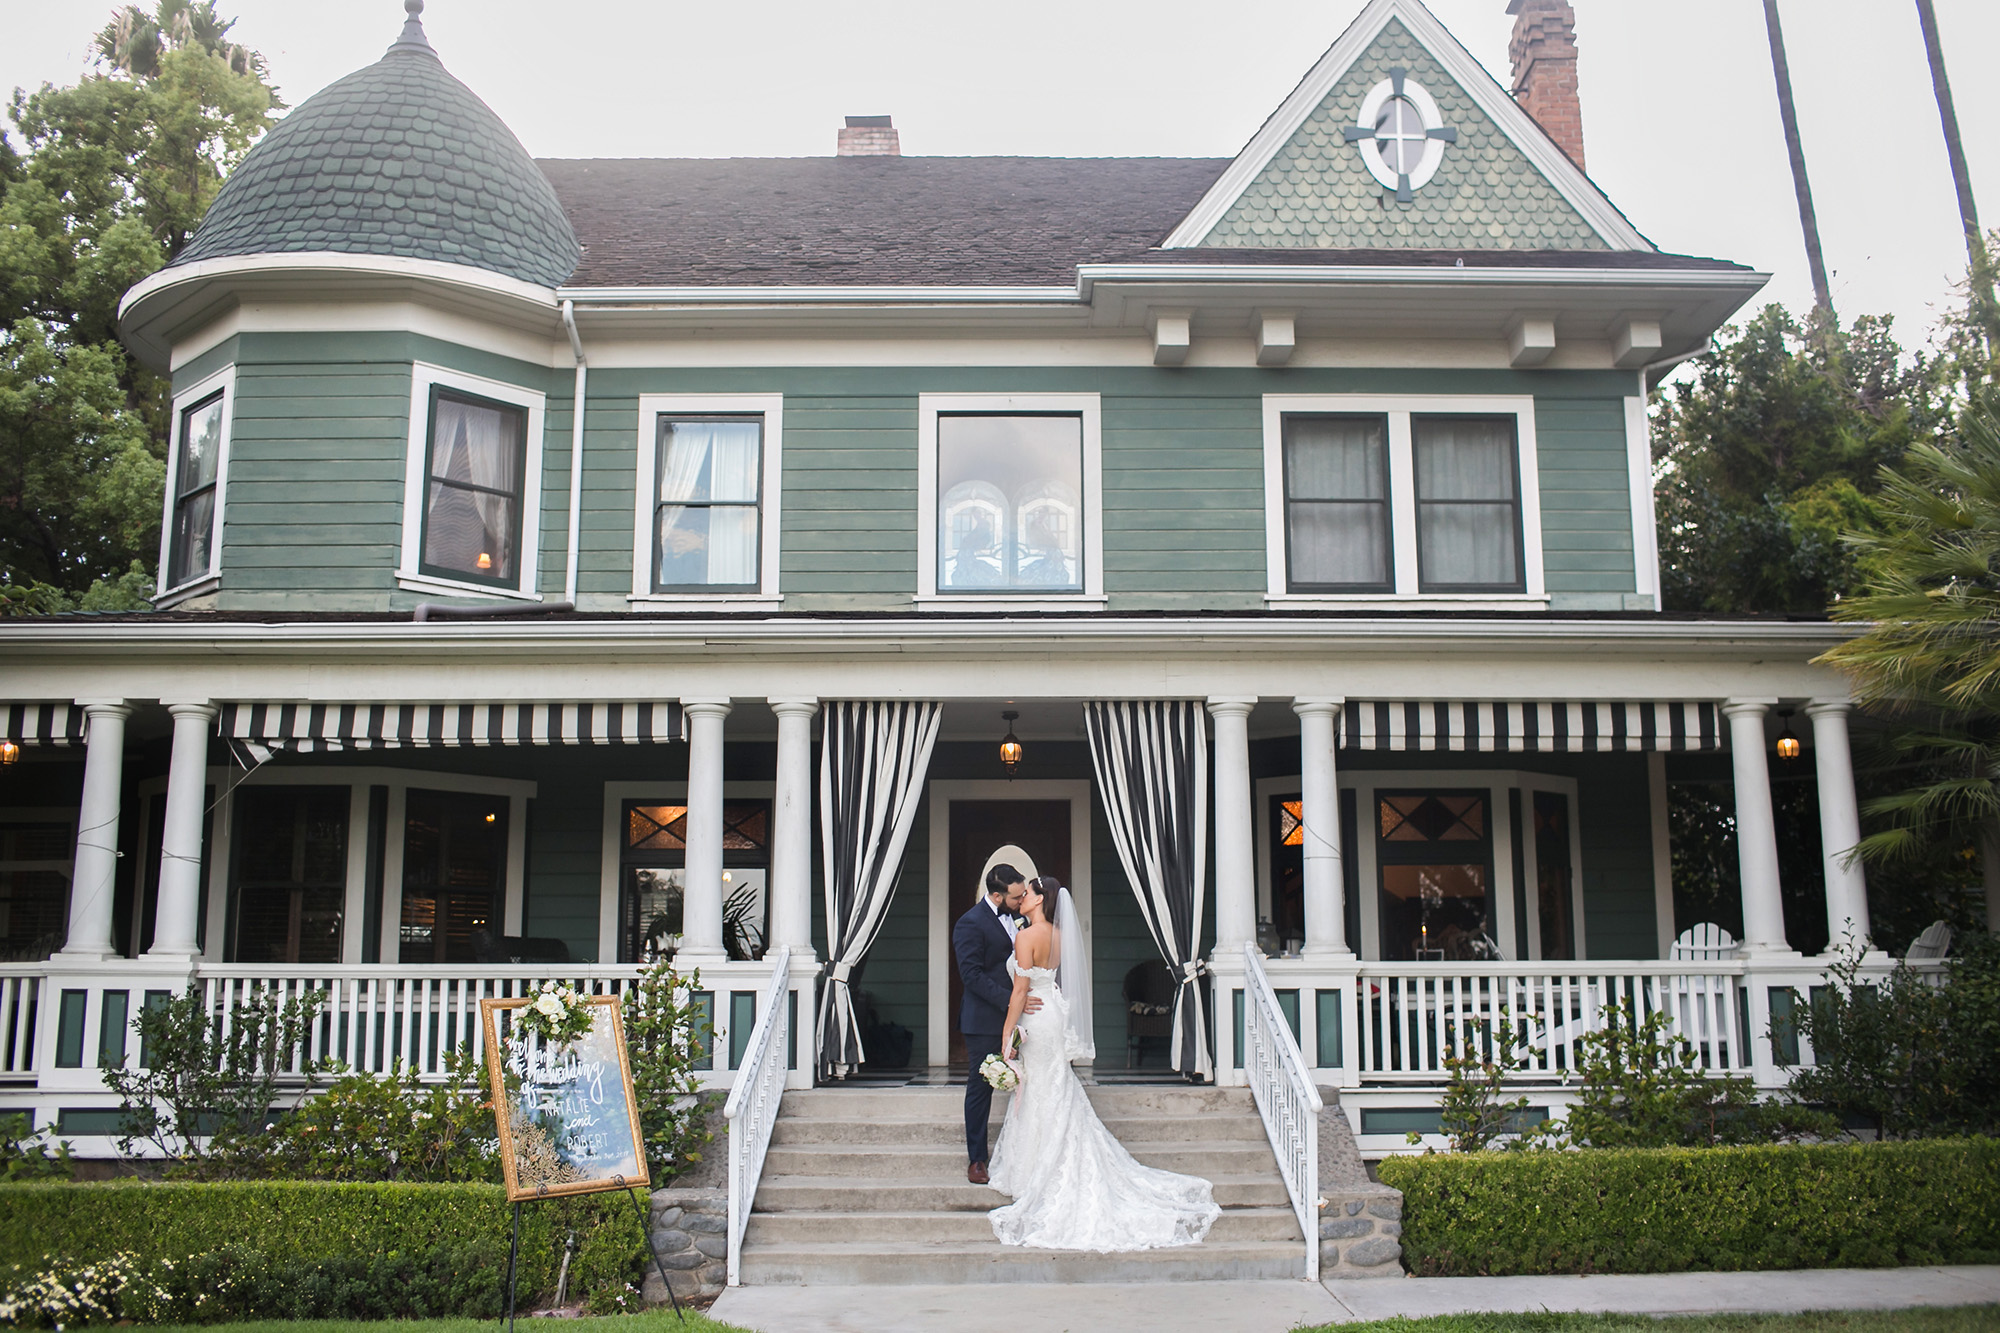 christmas-house-weddings-receptions-carrie-vines-114.jpg